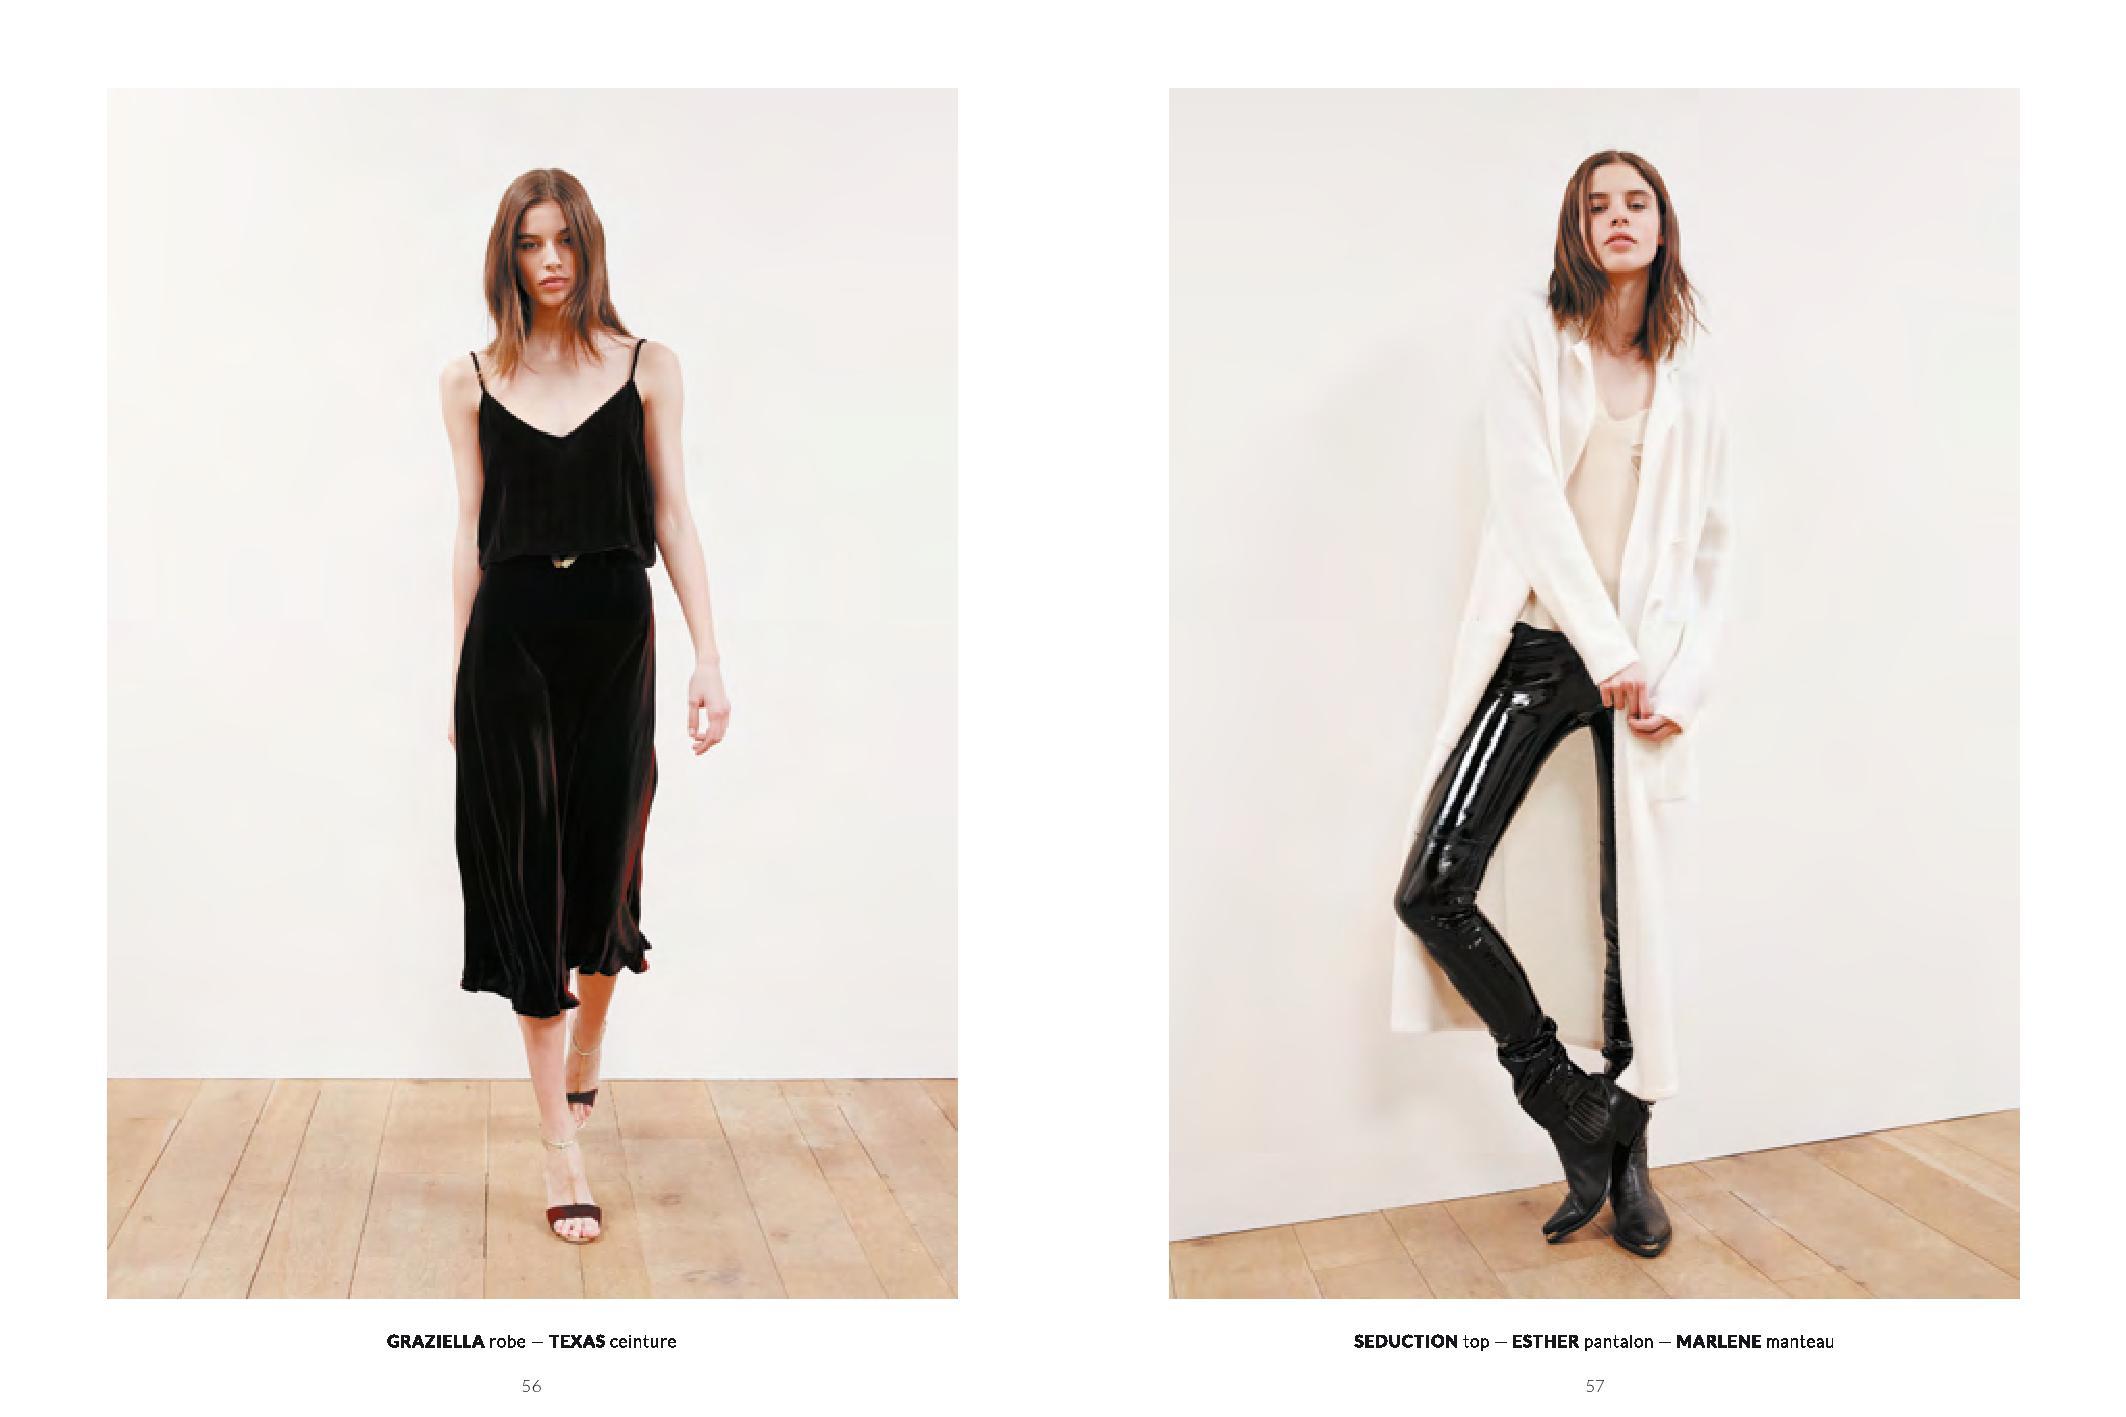 cc_md_lookbook_mes_demoiselles_paris_web_dresscode-page-031.jpg